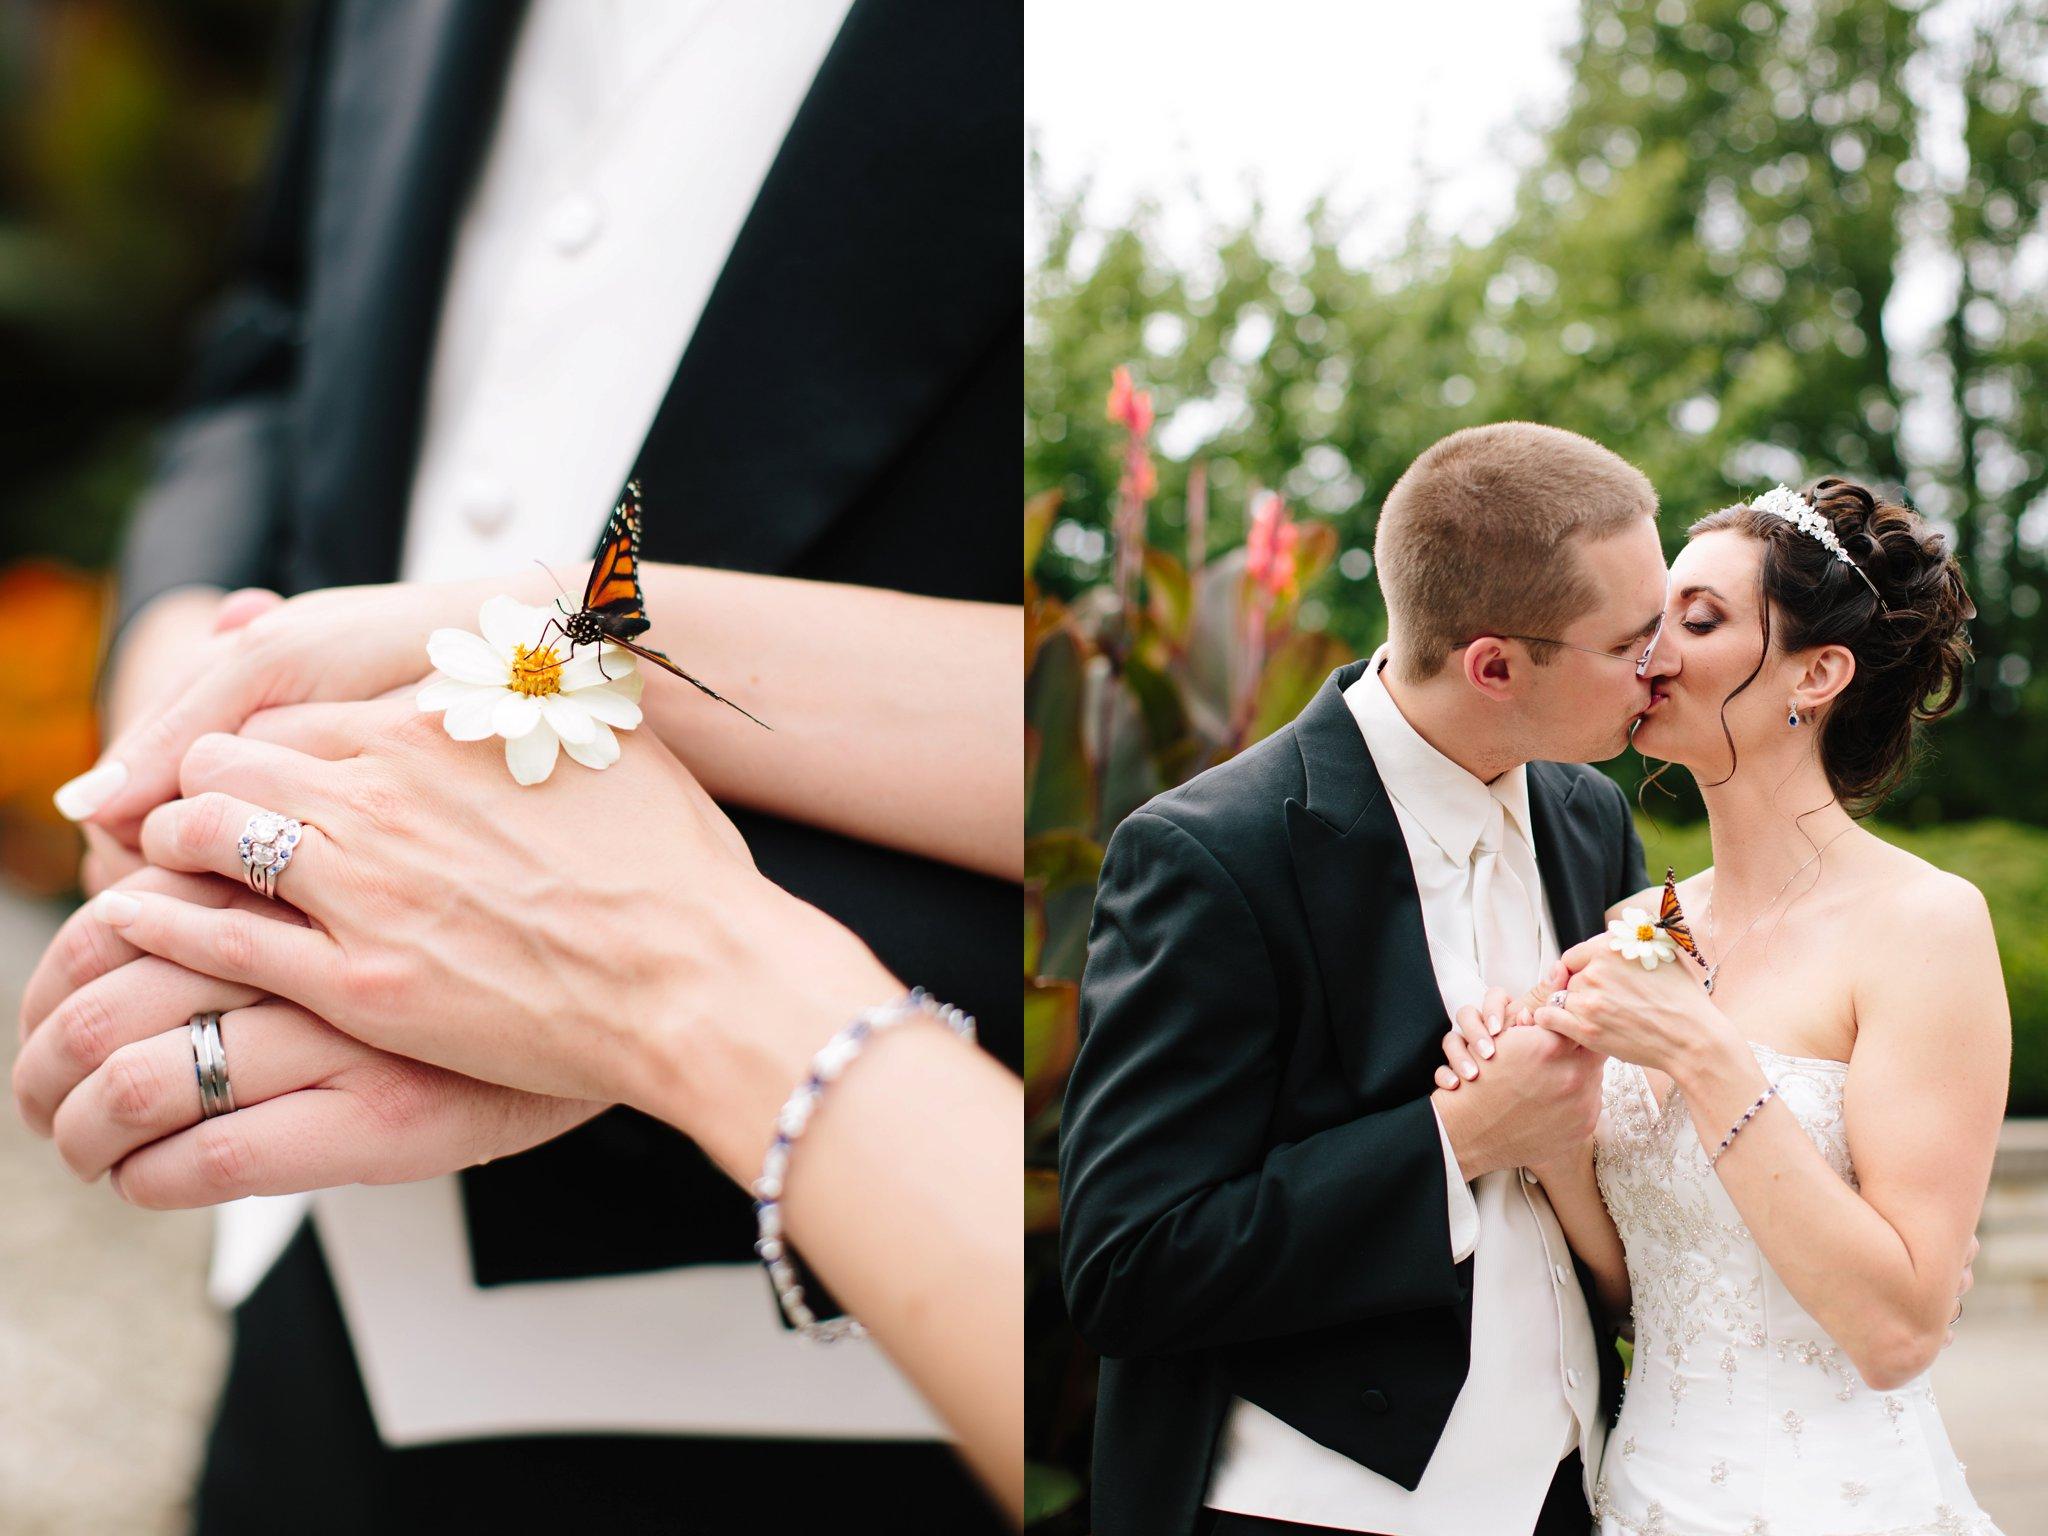 genettis_wilkes_barre_wedding_photos_0161.jpg